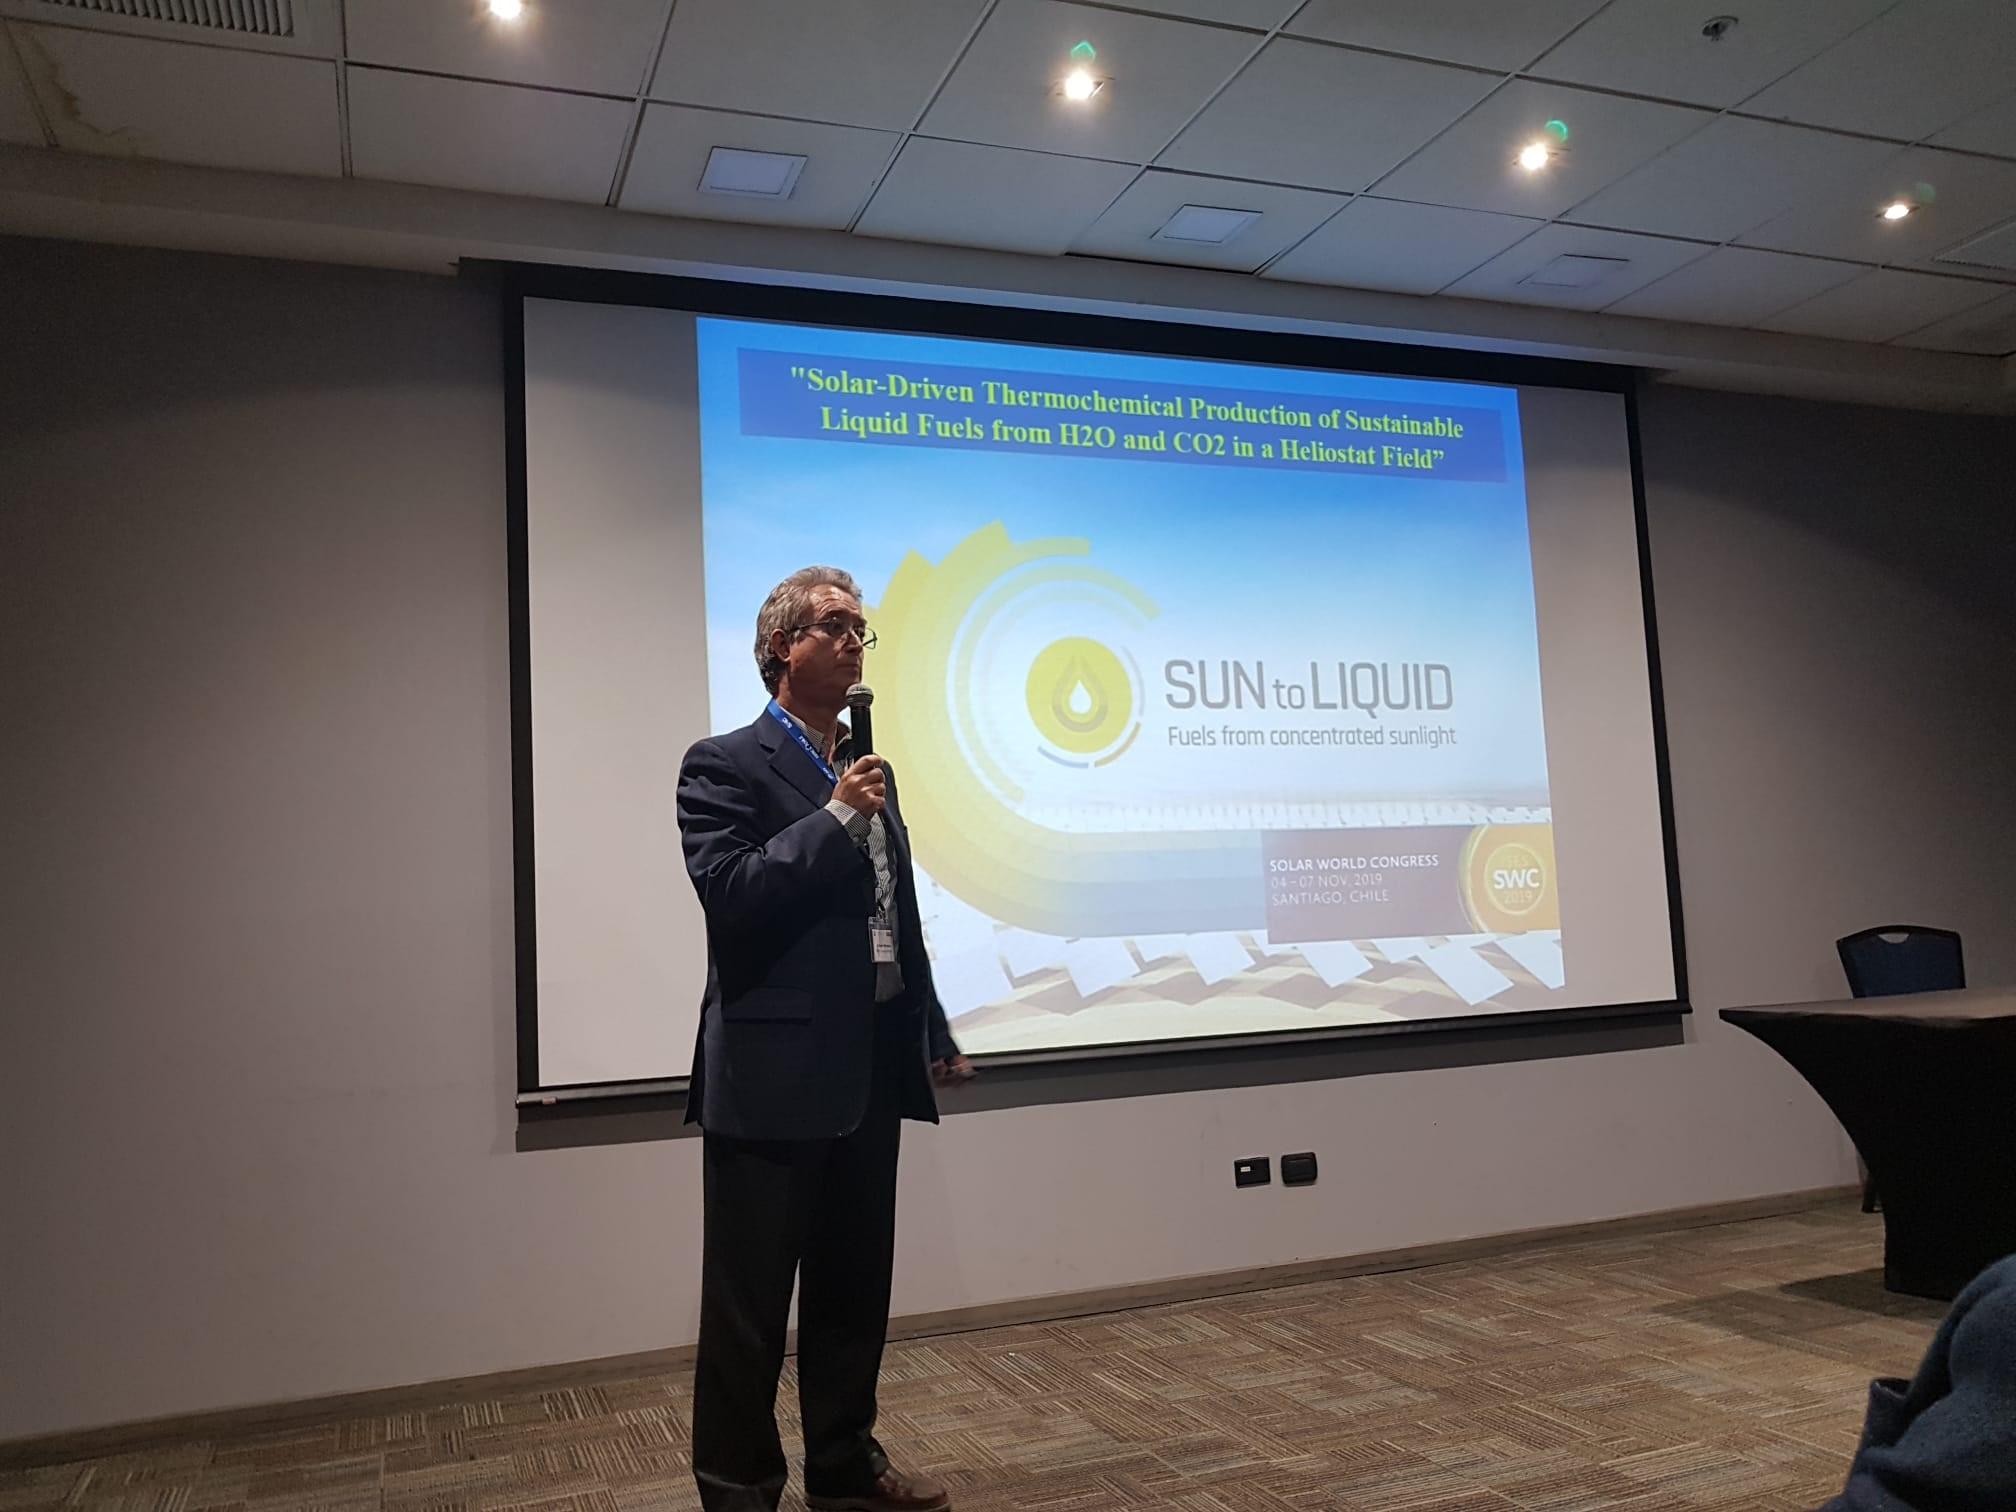 MRomero at Solar World Congress 2019 in Chile